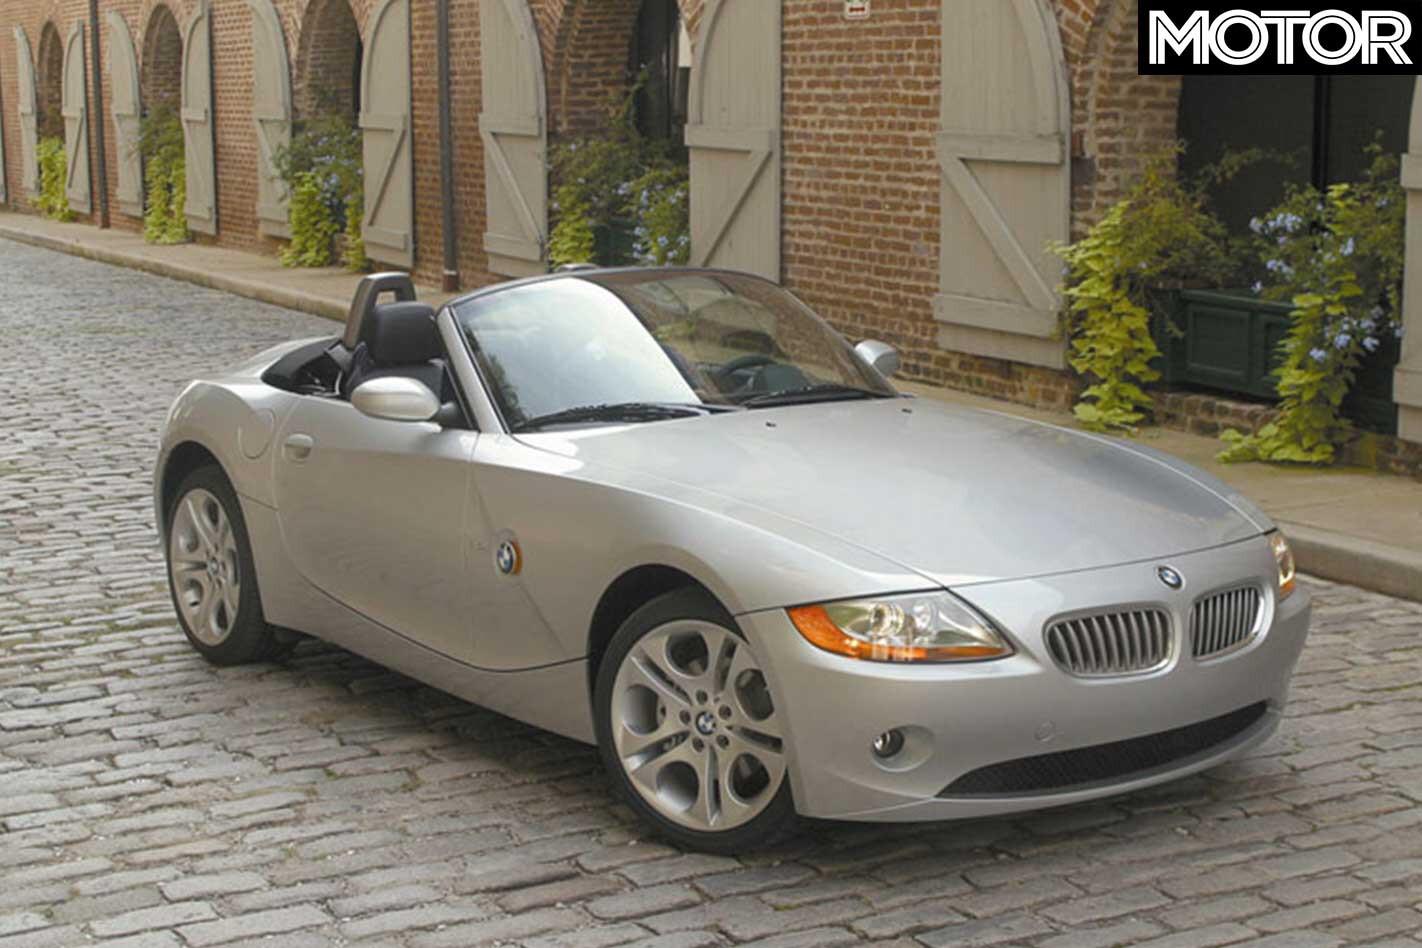 2004 BMW Z 4 Roadster 2 5 Jpg